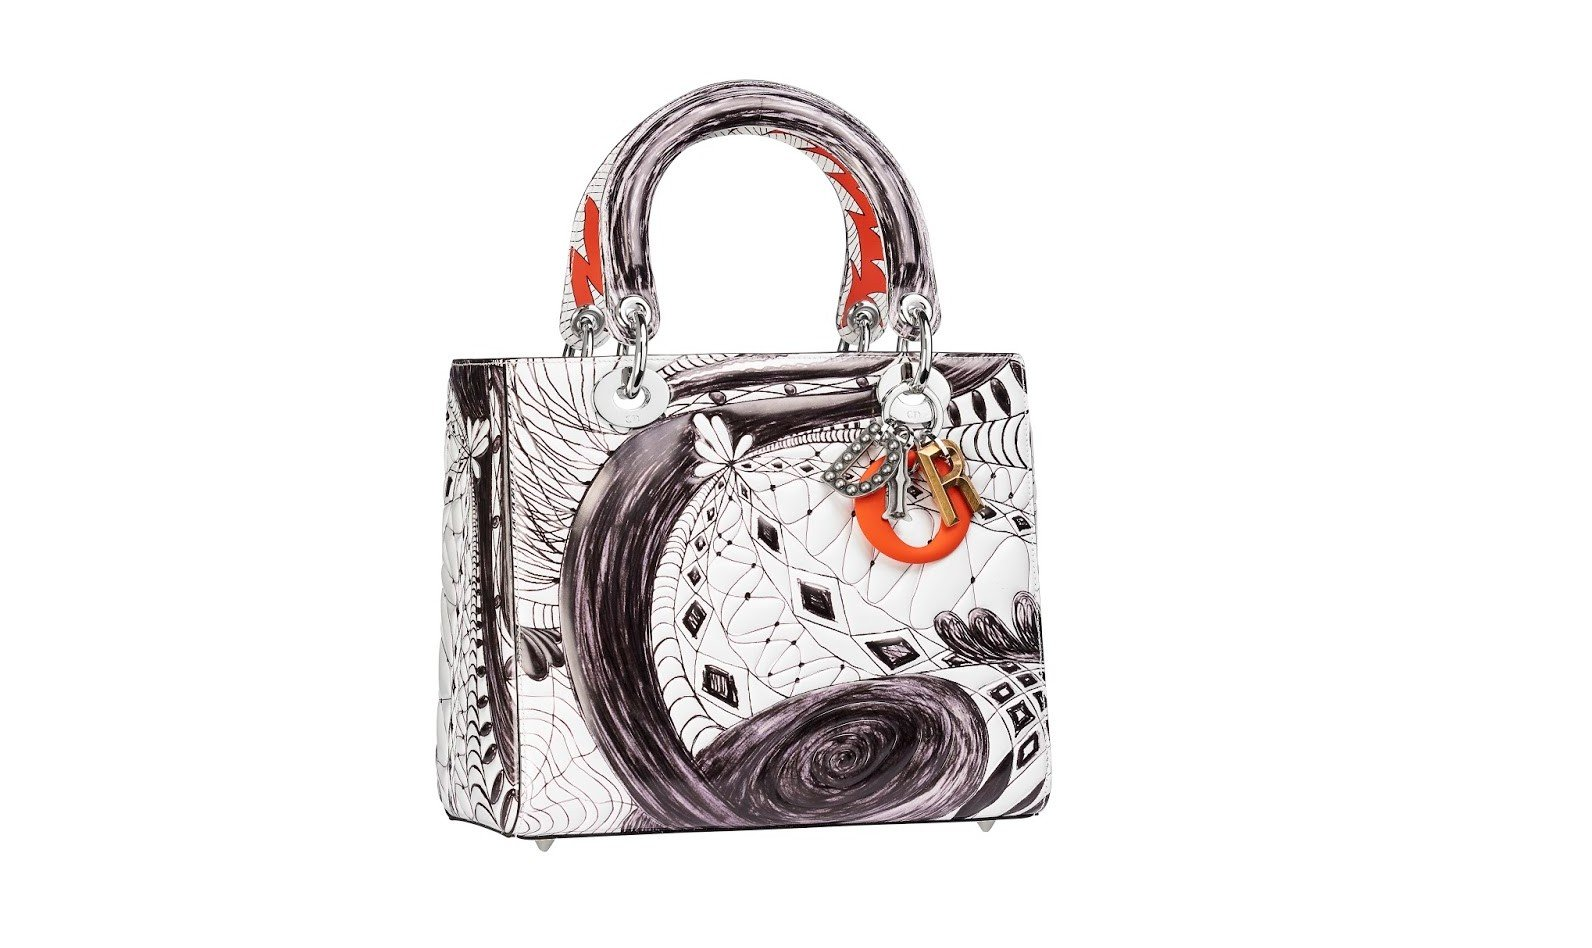 Dior-Ladyart2-Jack-Pierson-TheLuxuryTrends